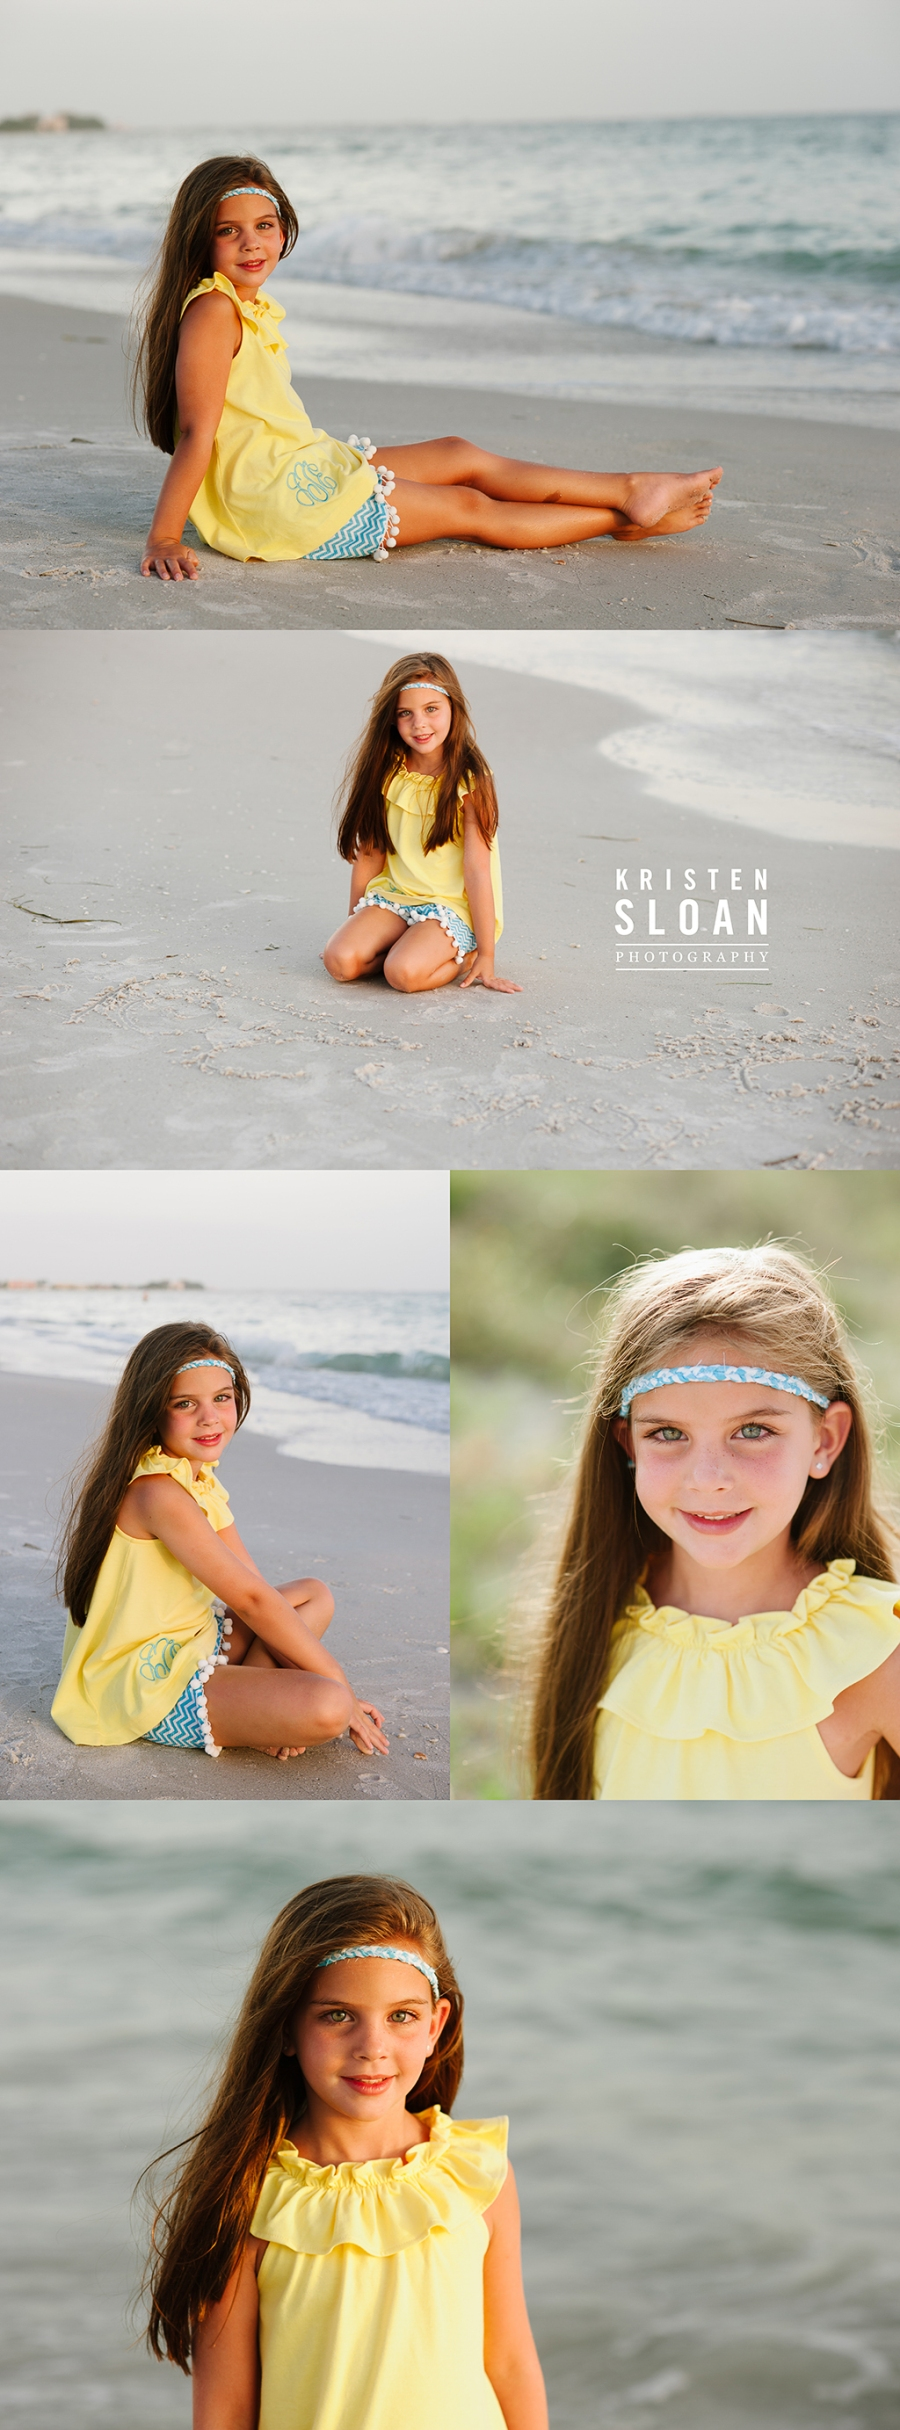 St Pete Beach Treasure Island Photographer Kristen Sloan